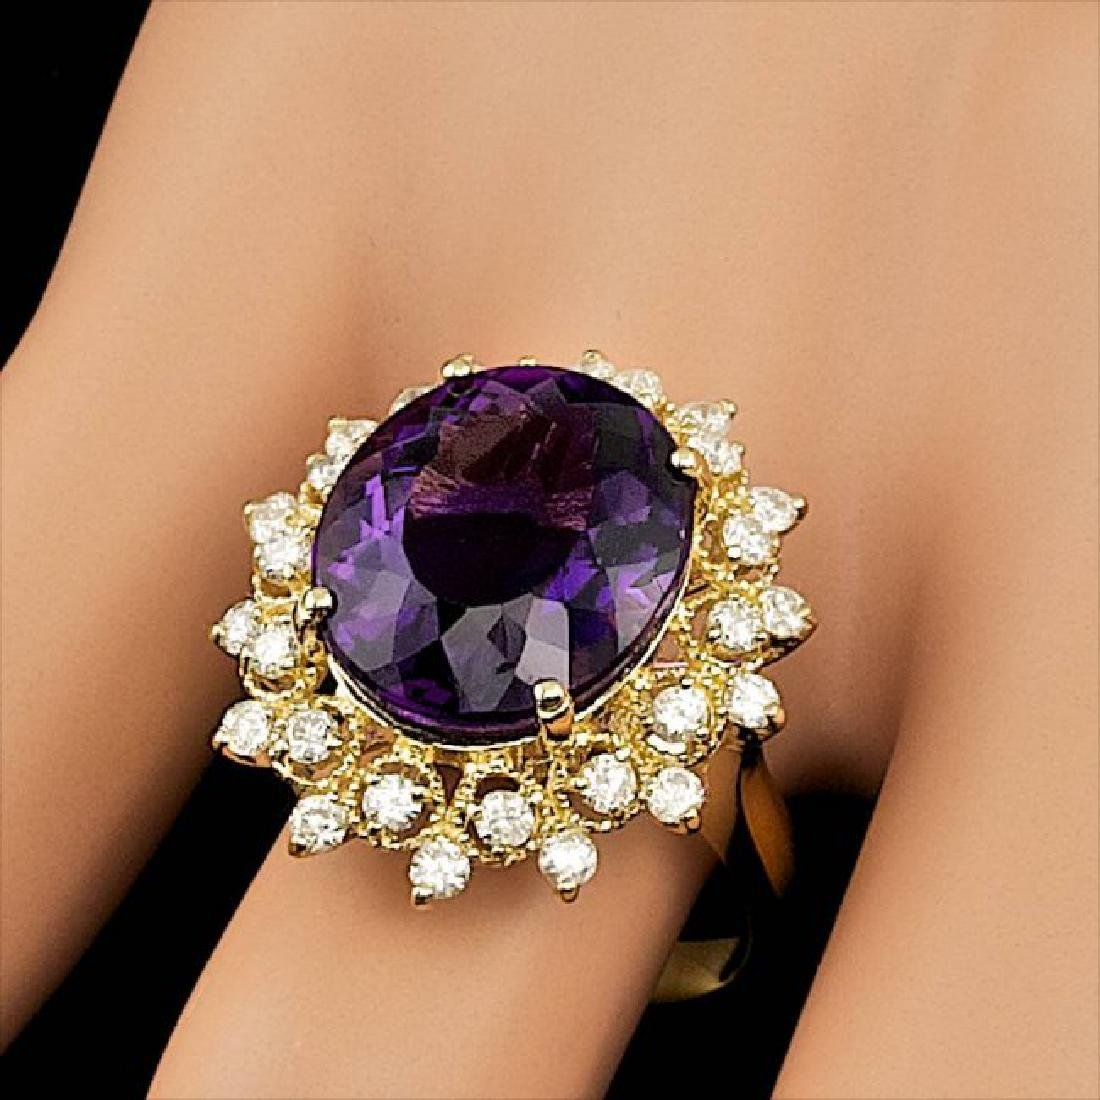 14k Gold 8.00ct Amethyst 0.80ct Diamond Ring - 7